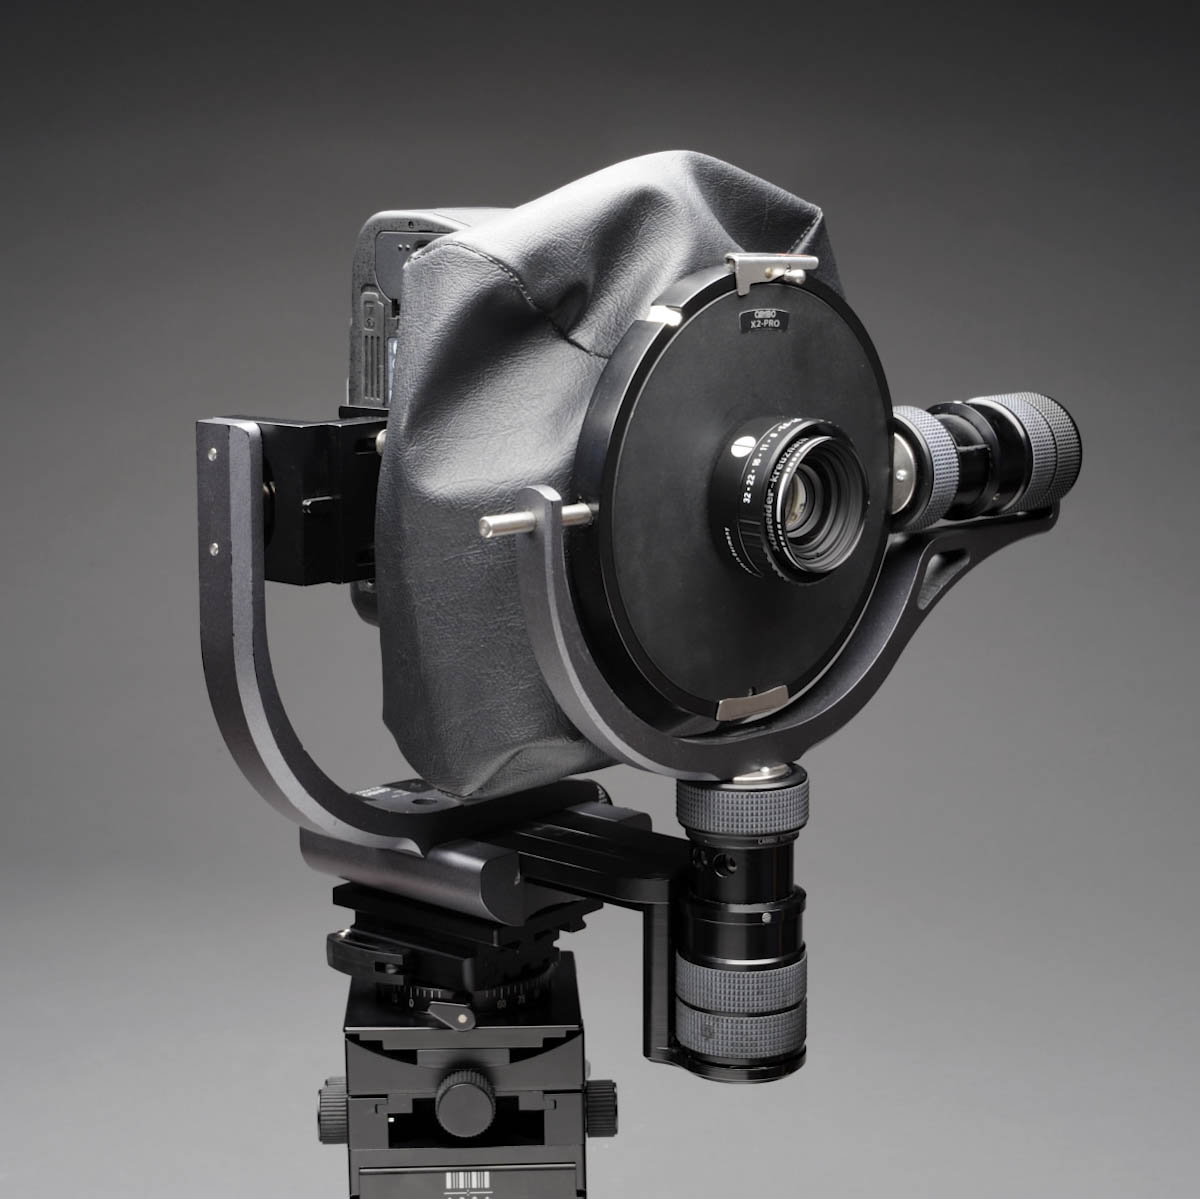 Nikon-D800-Cambo-X2-Pro-Schneider-Kreuznach-APO-90mm-f4.5-12